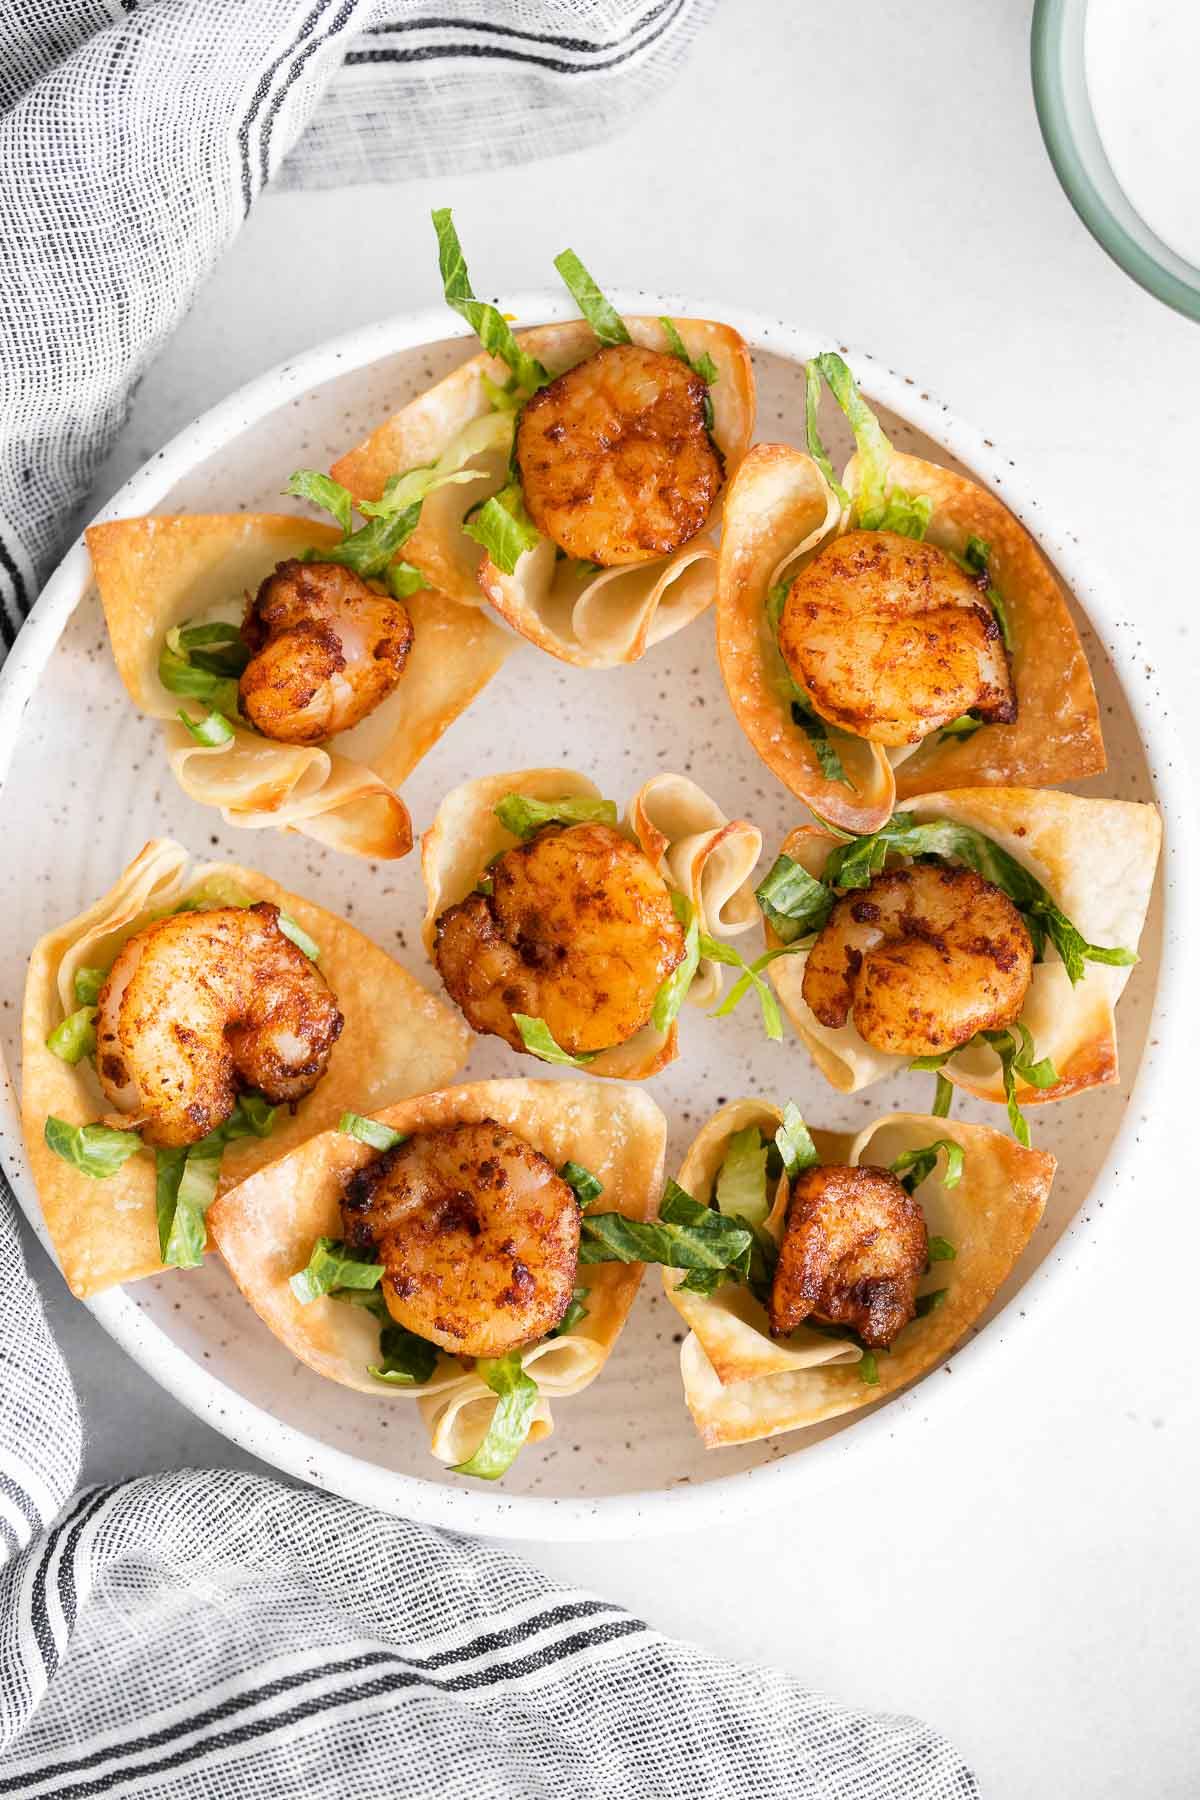 seven shrimp taco bites in a white round serving dish